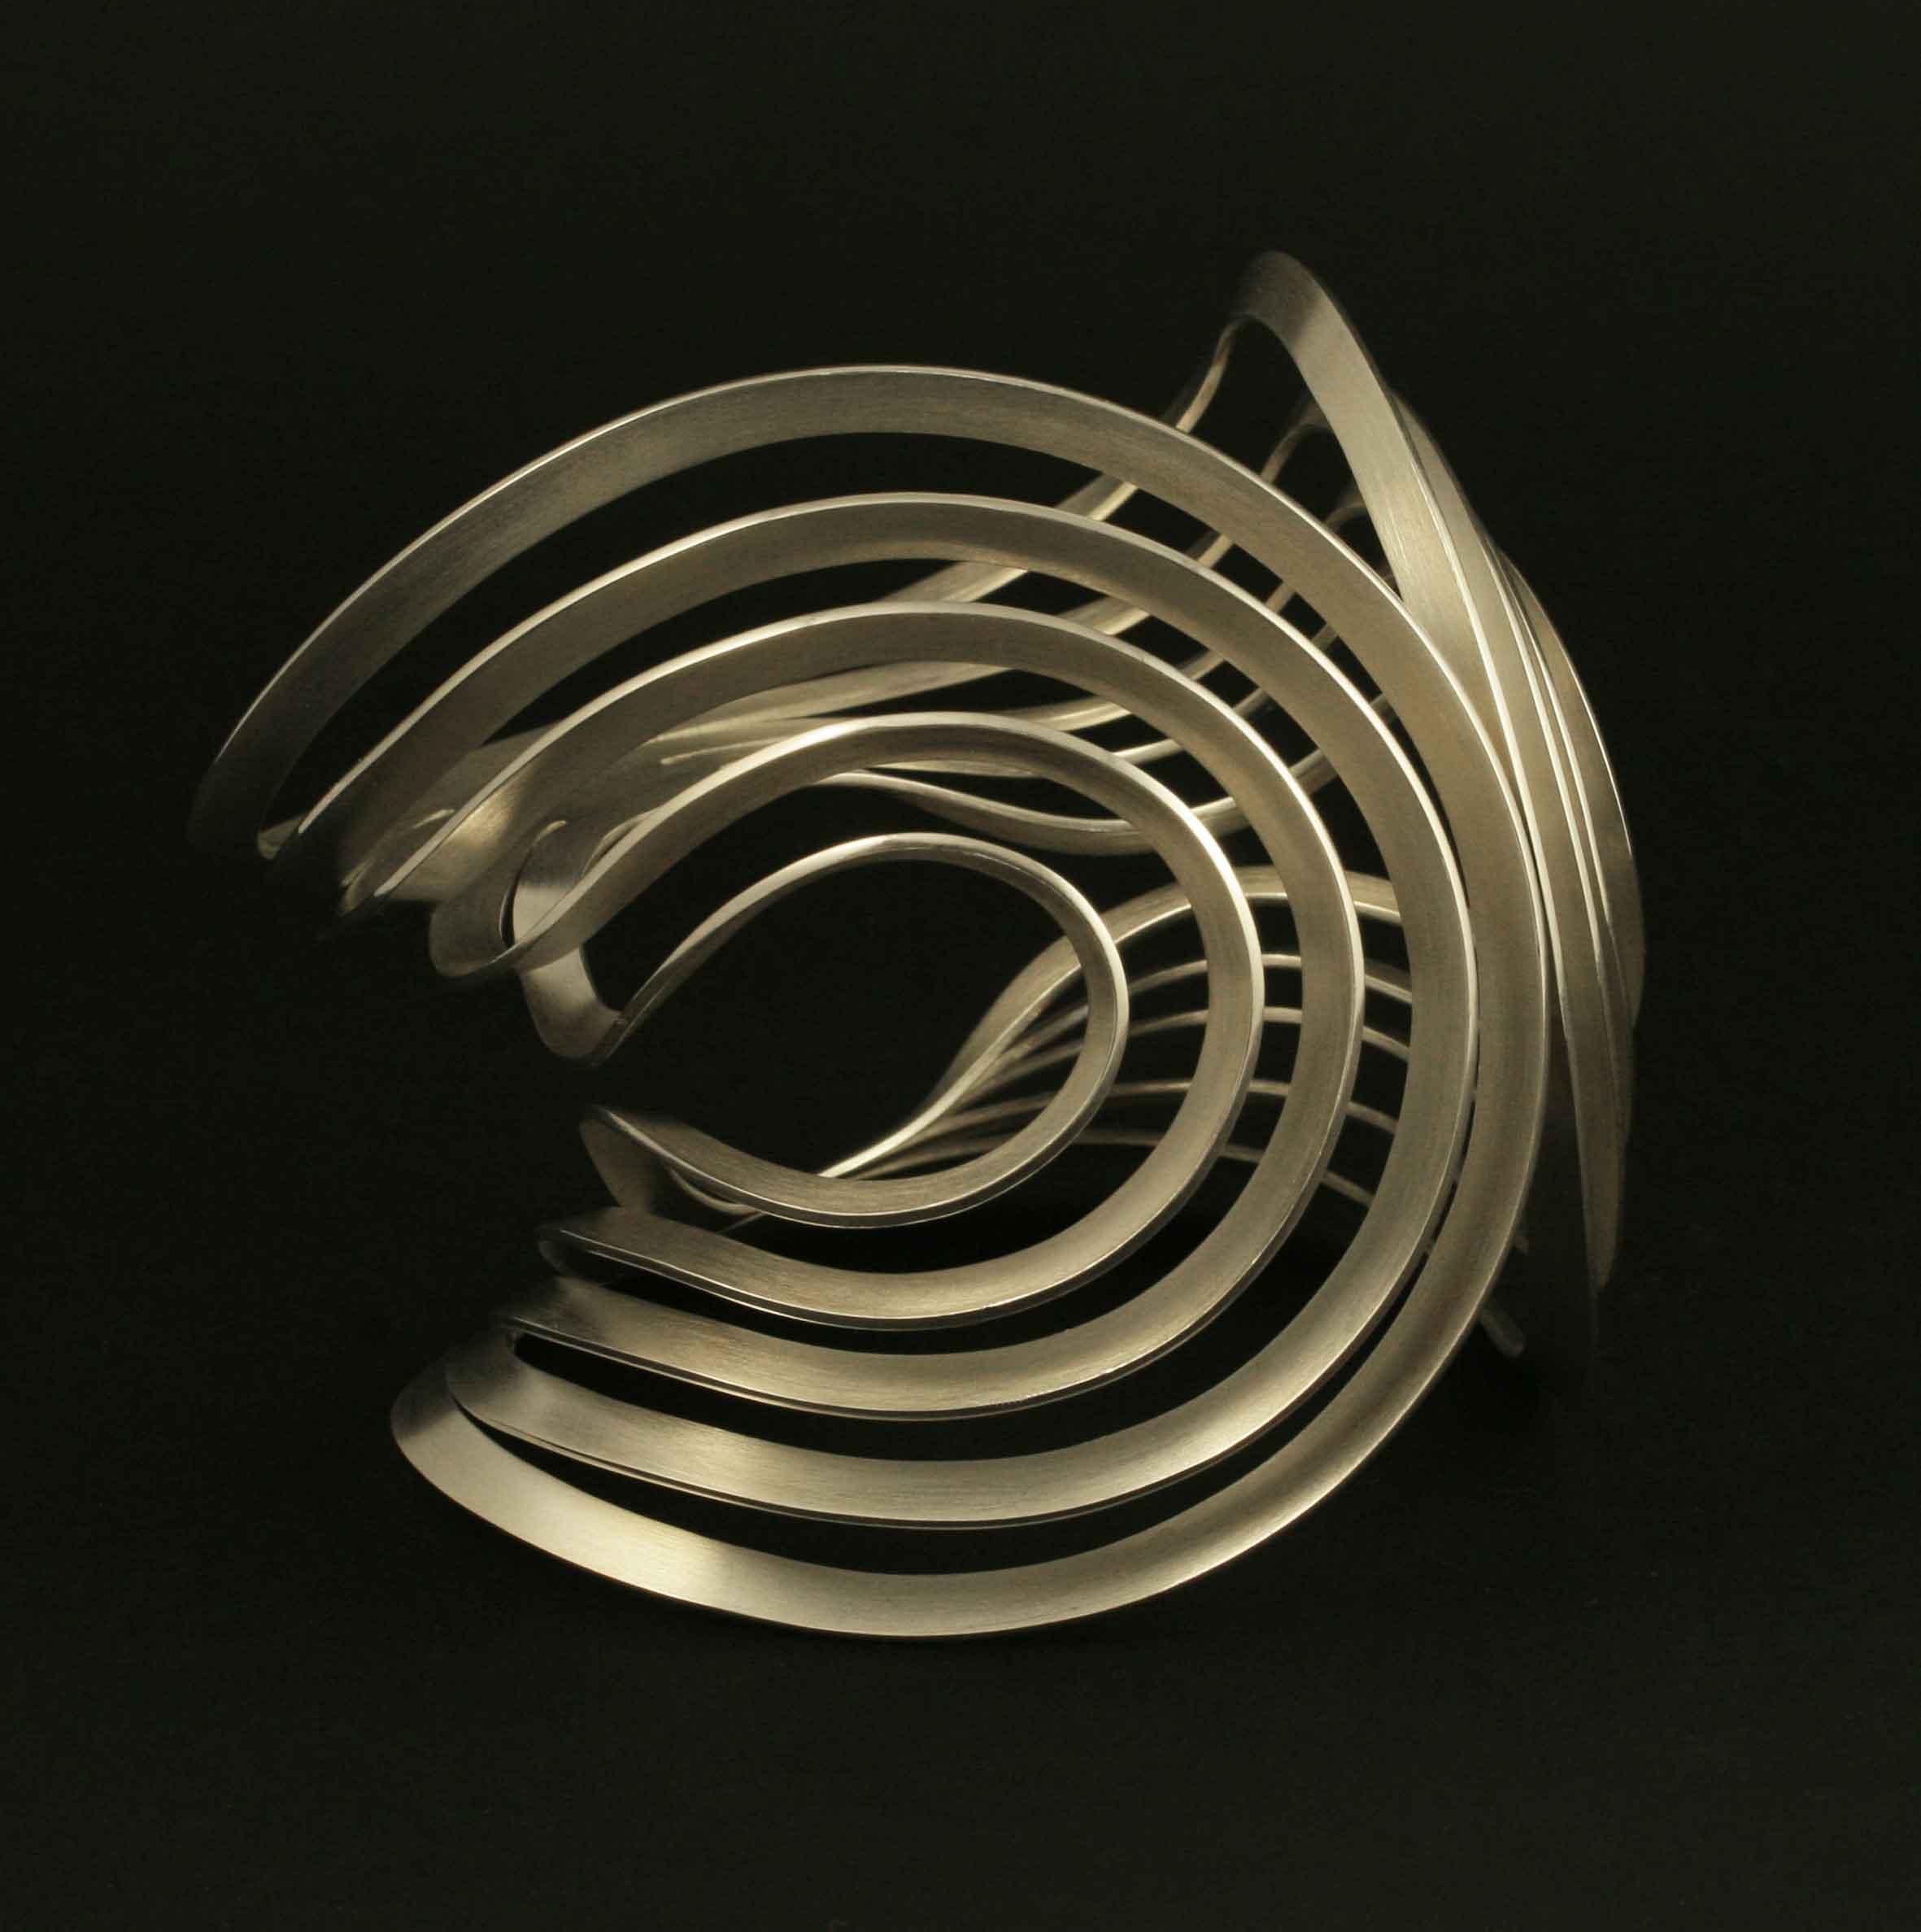 3c silver bangle.jpg